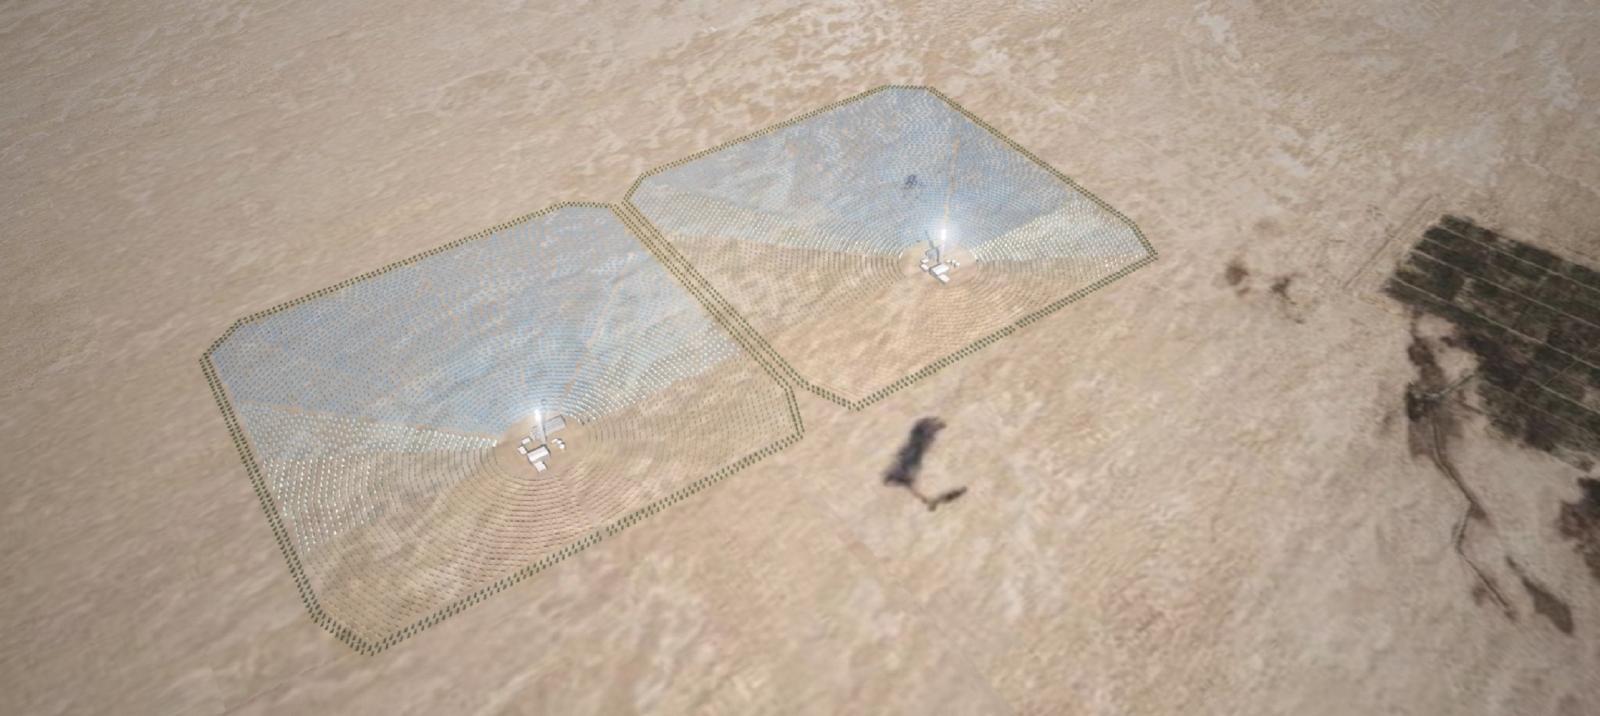 sahara solar power plant renewable